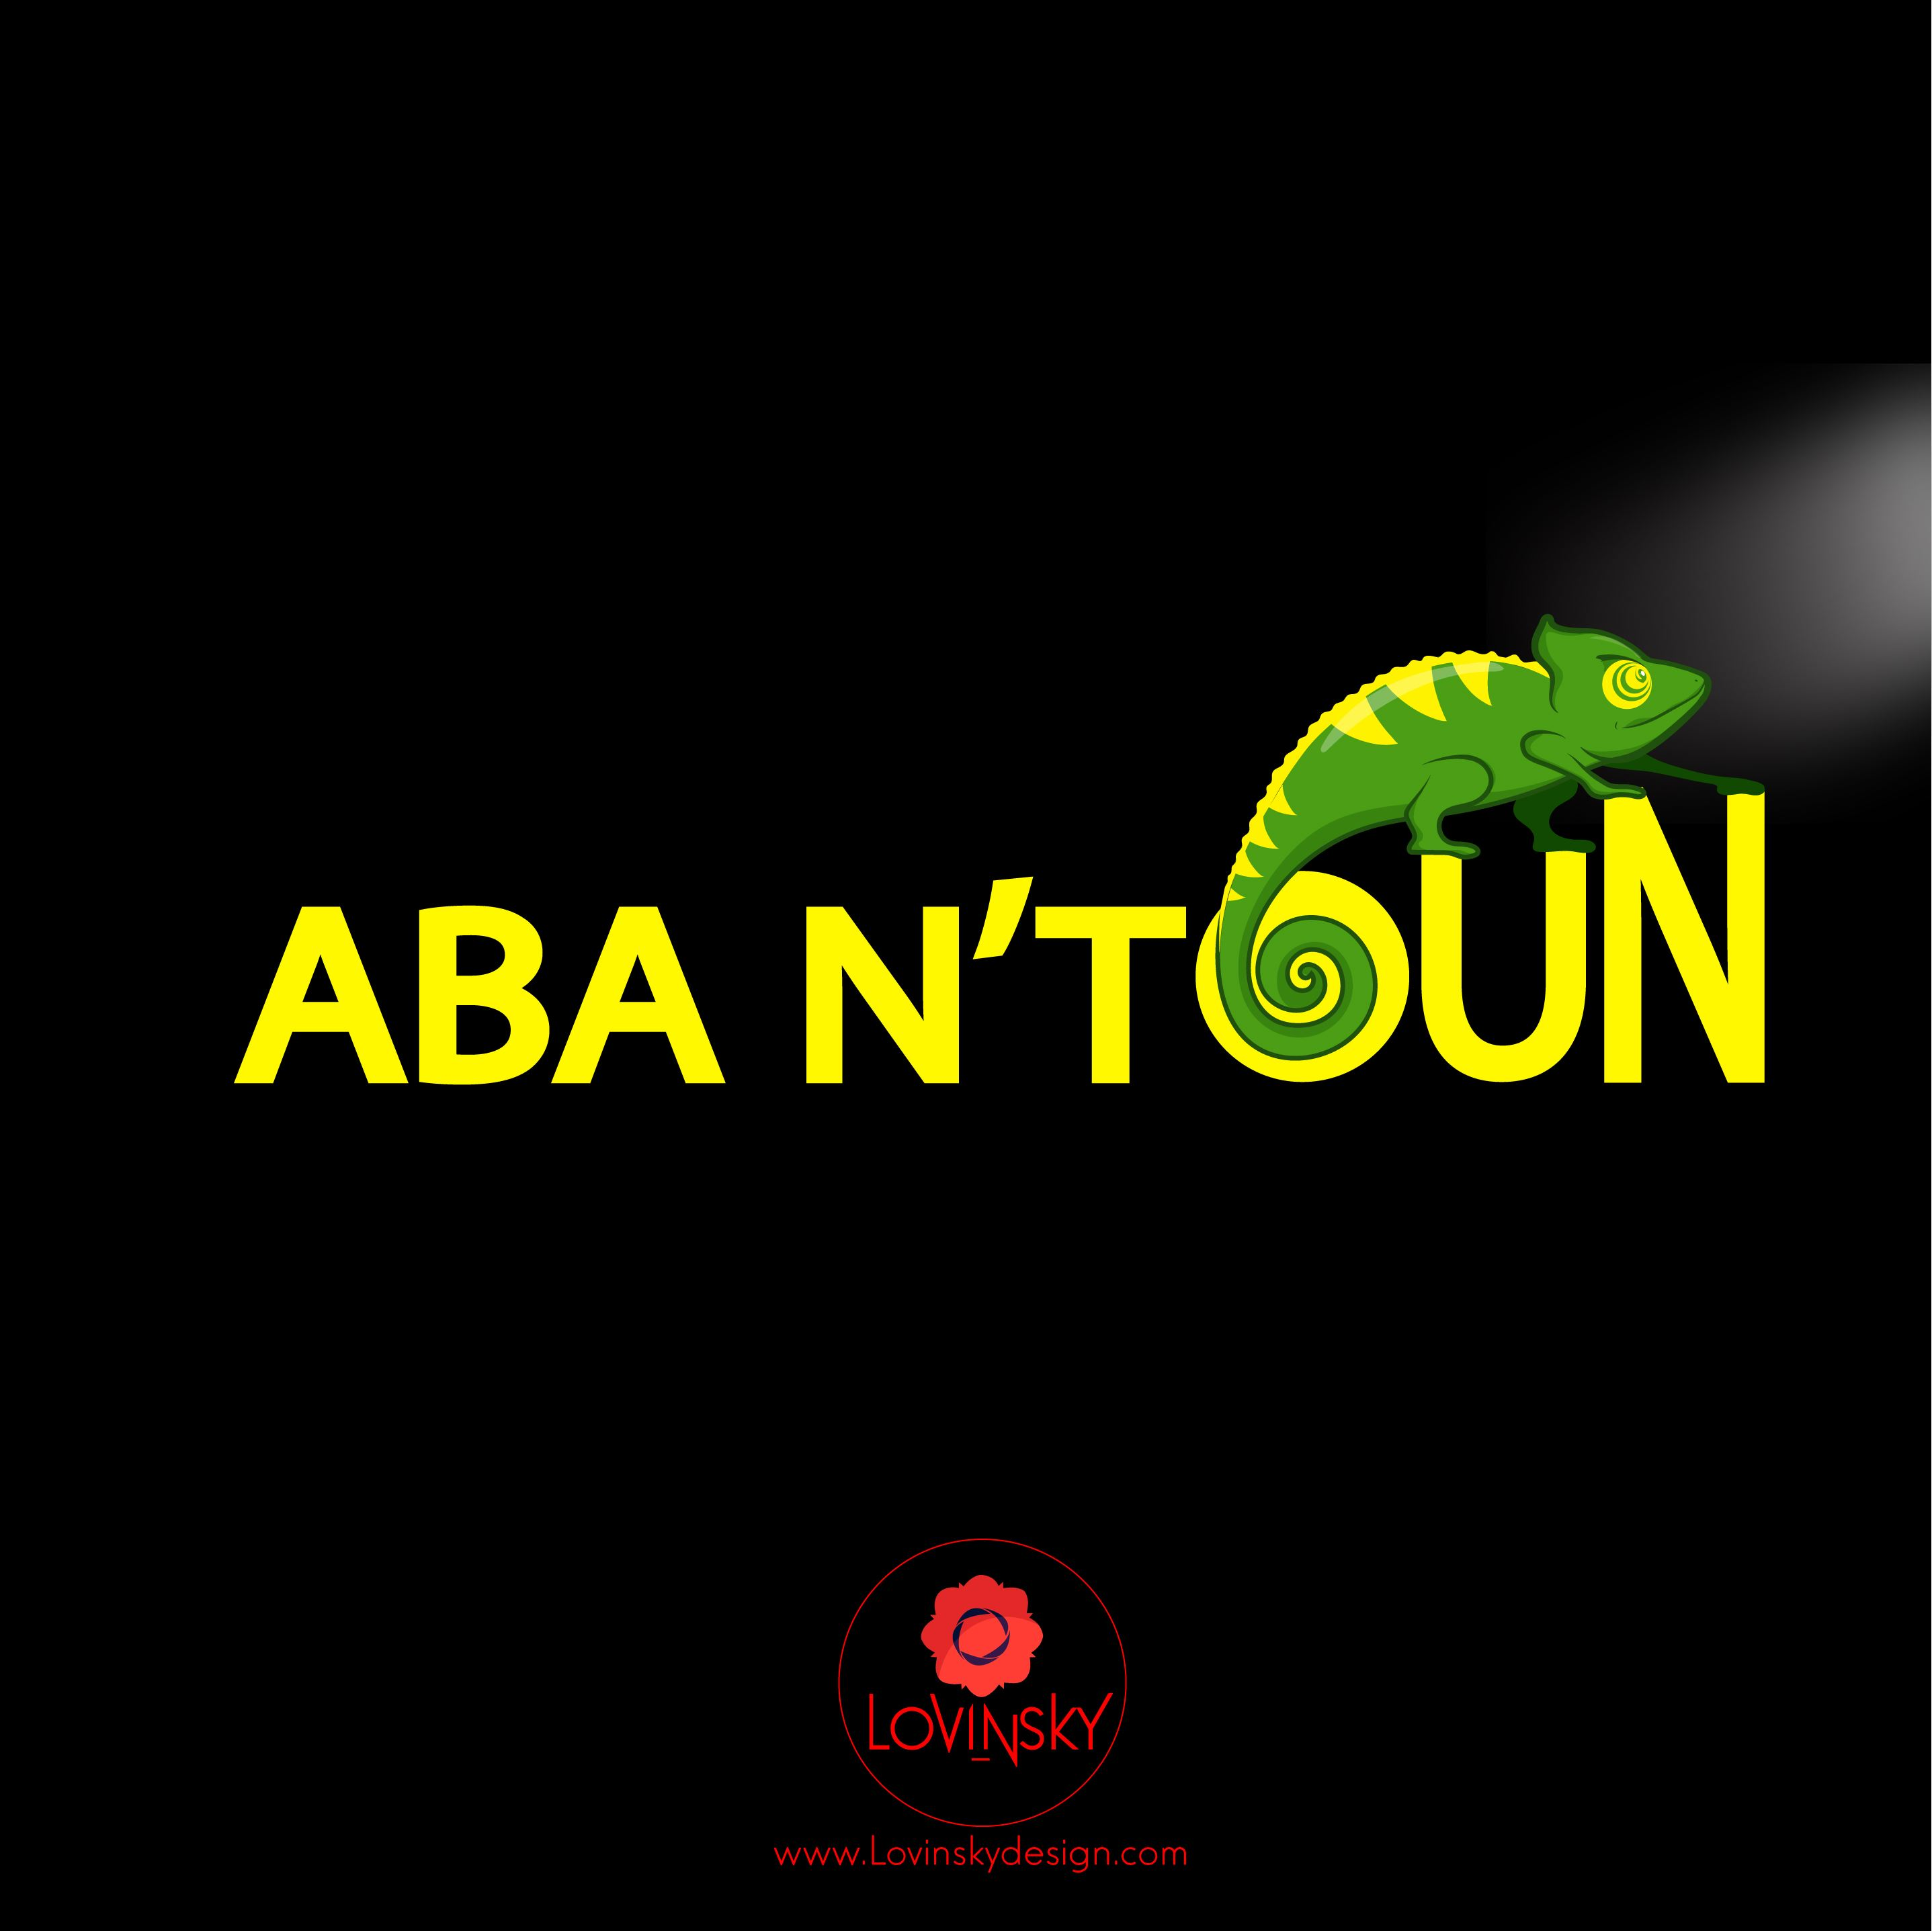 aban'toun logo lovinsky graphiste webdesigner freelance nantes 44